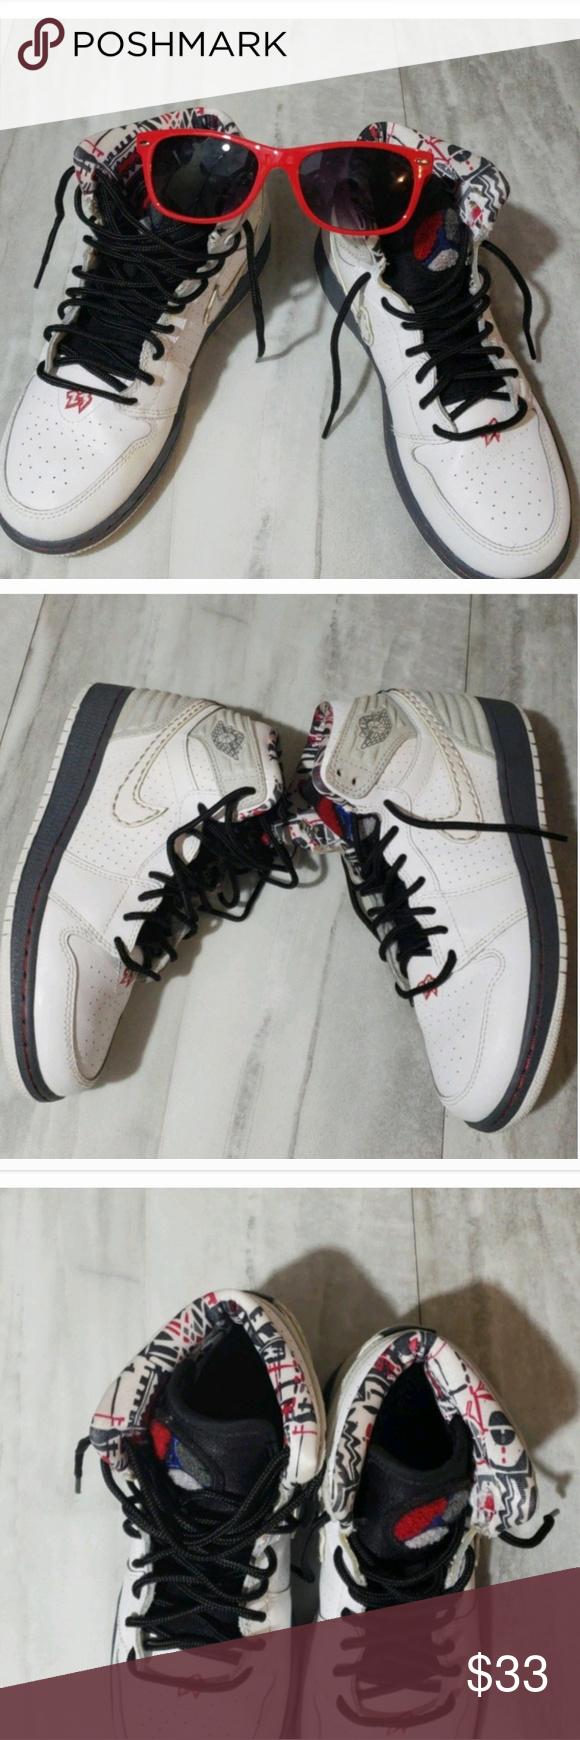 89af0a4d742de6 Nike Air Jordan Boys Size 4 White Red Gray Black Nike Air Jordan Boys Size 4